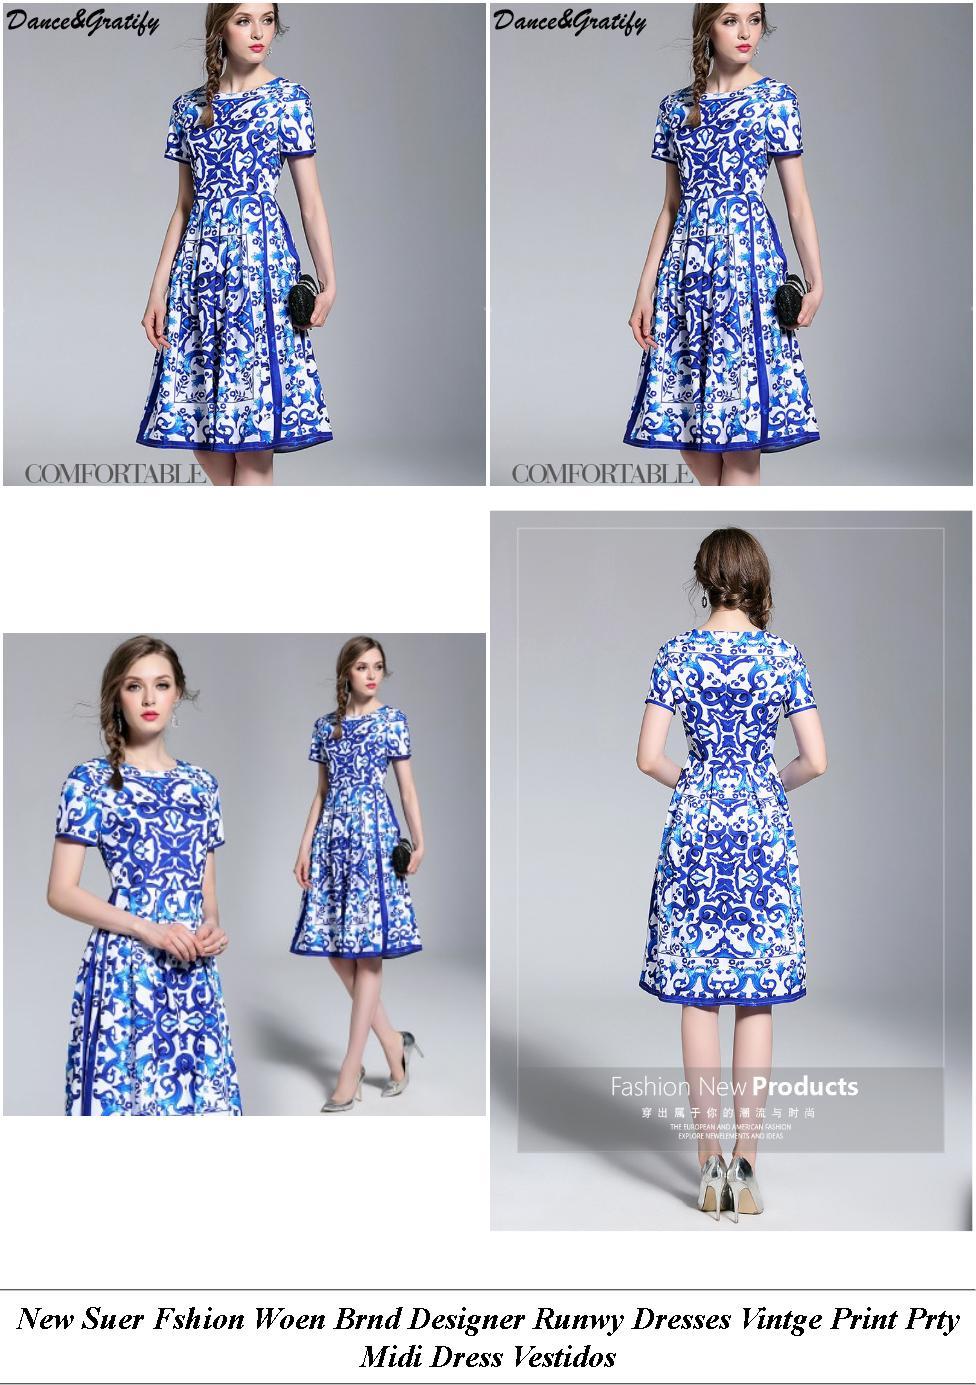 Modest Muslimah Wear - Uy Second Hand Designer Clothes App - Formal Dresses For Juniors